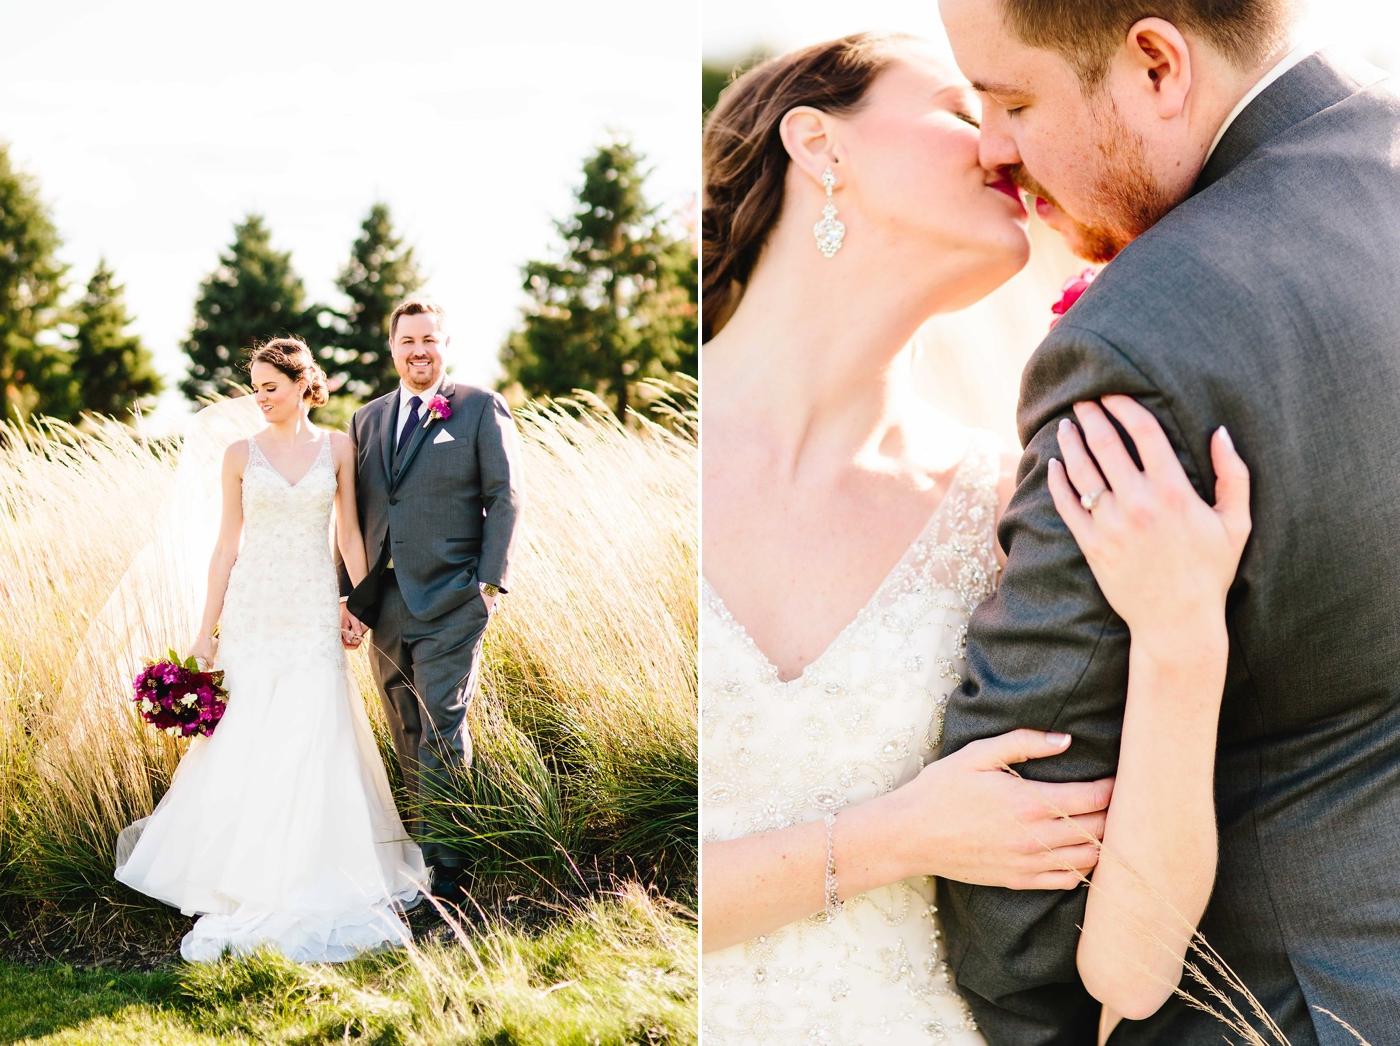 chicago-fine-art-wedding-photography-wood23